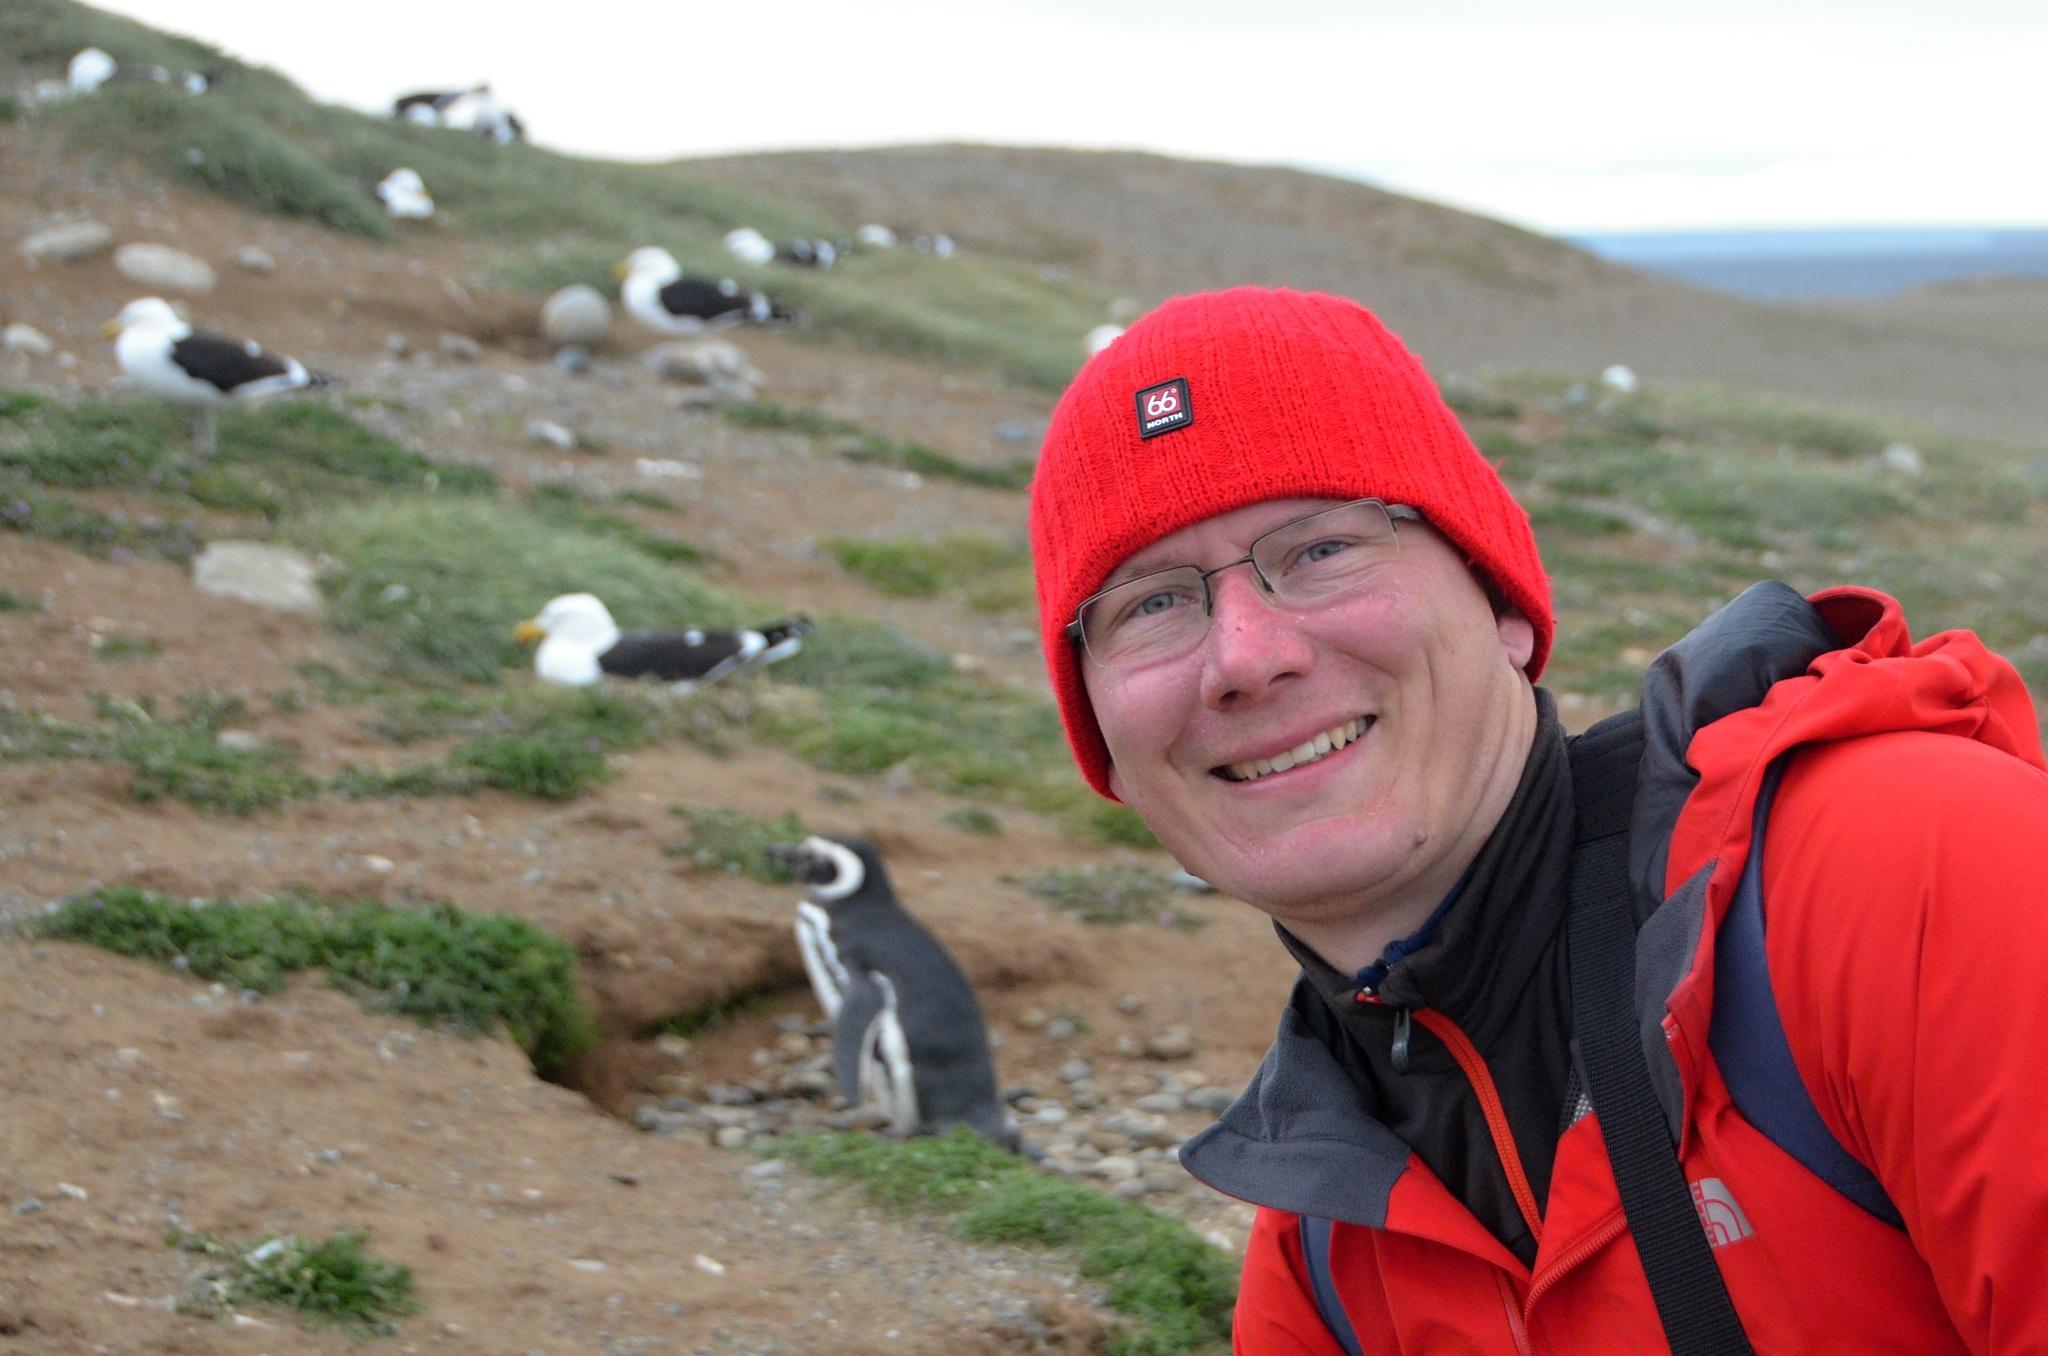 Moje maličkost a tučňáci